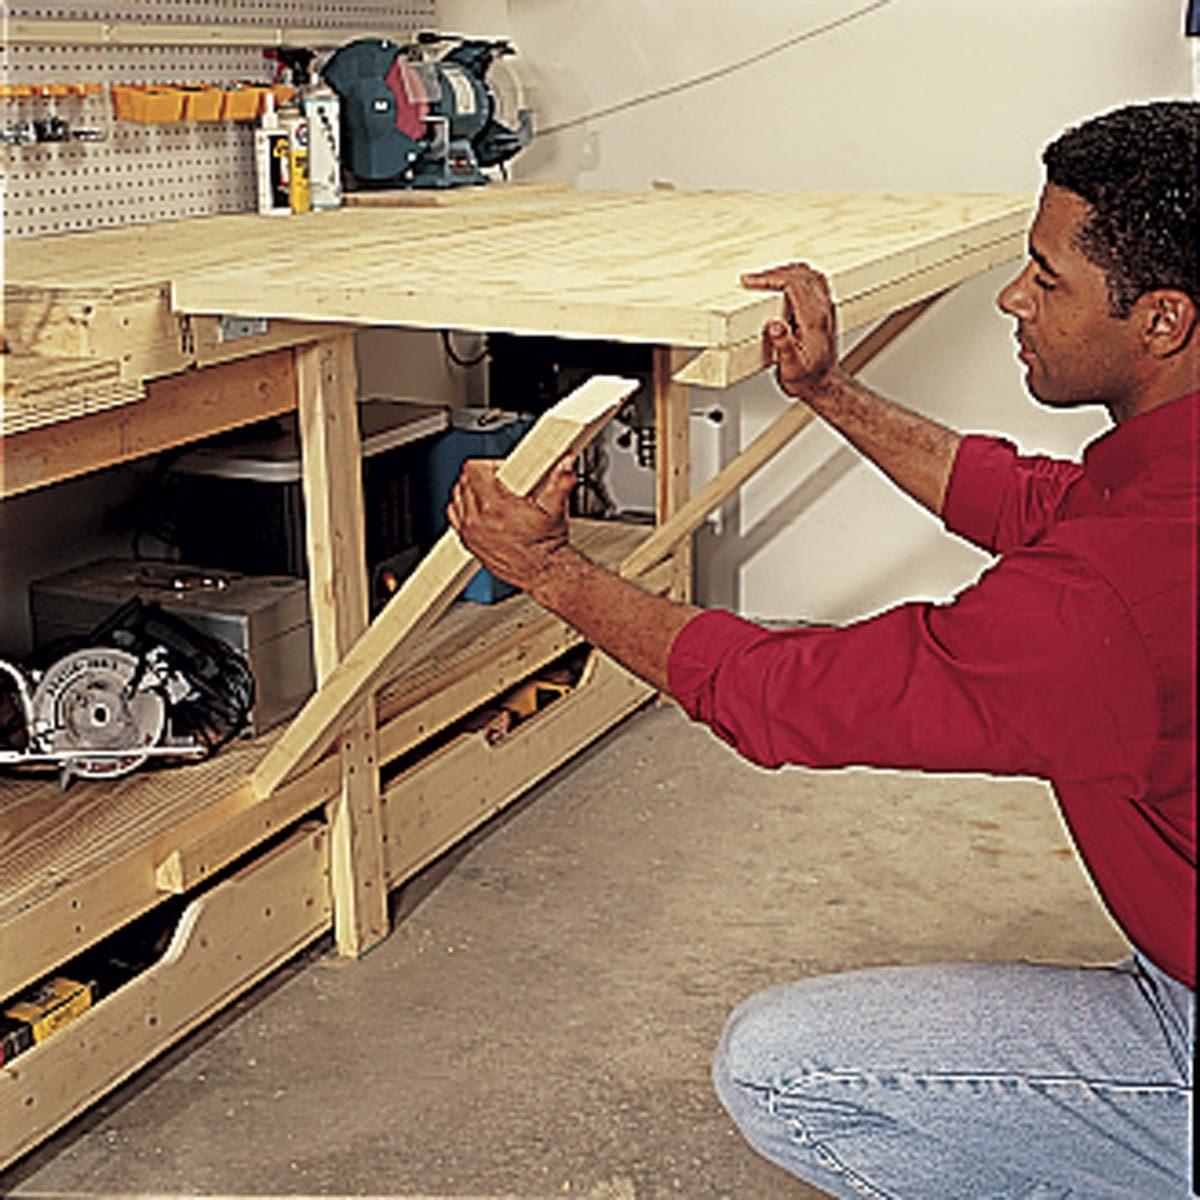 The Family Handyman: Modular Workbench Plans: How To Build A Modular Workbench